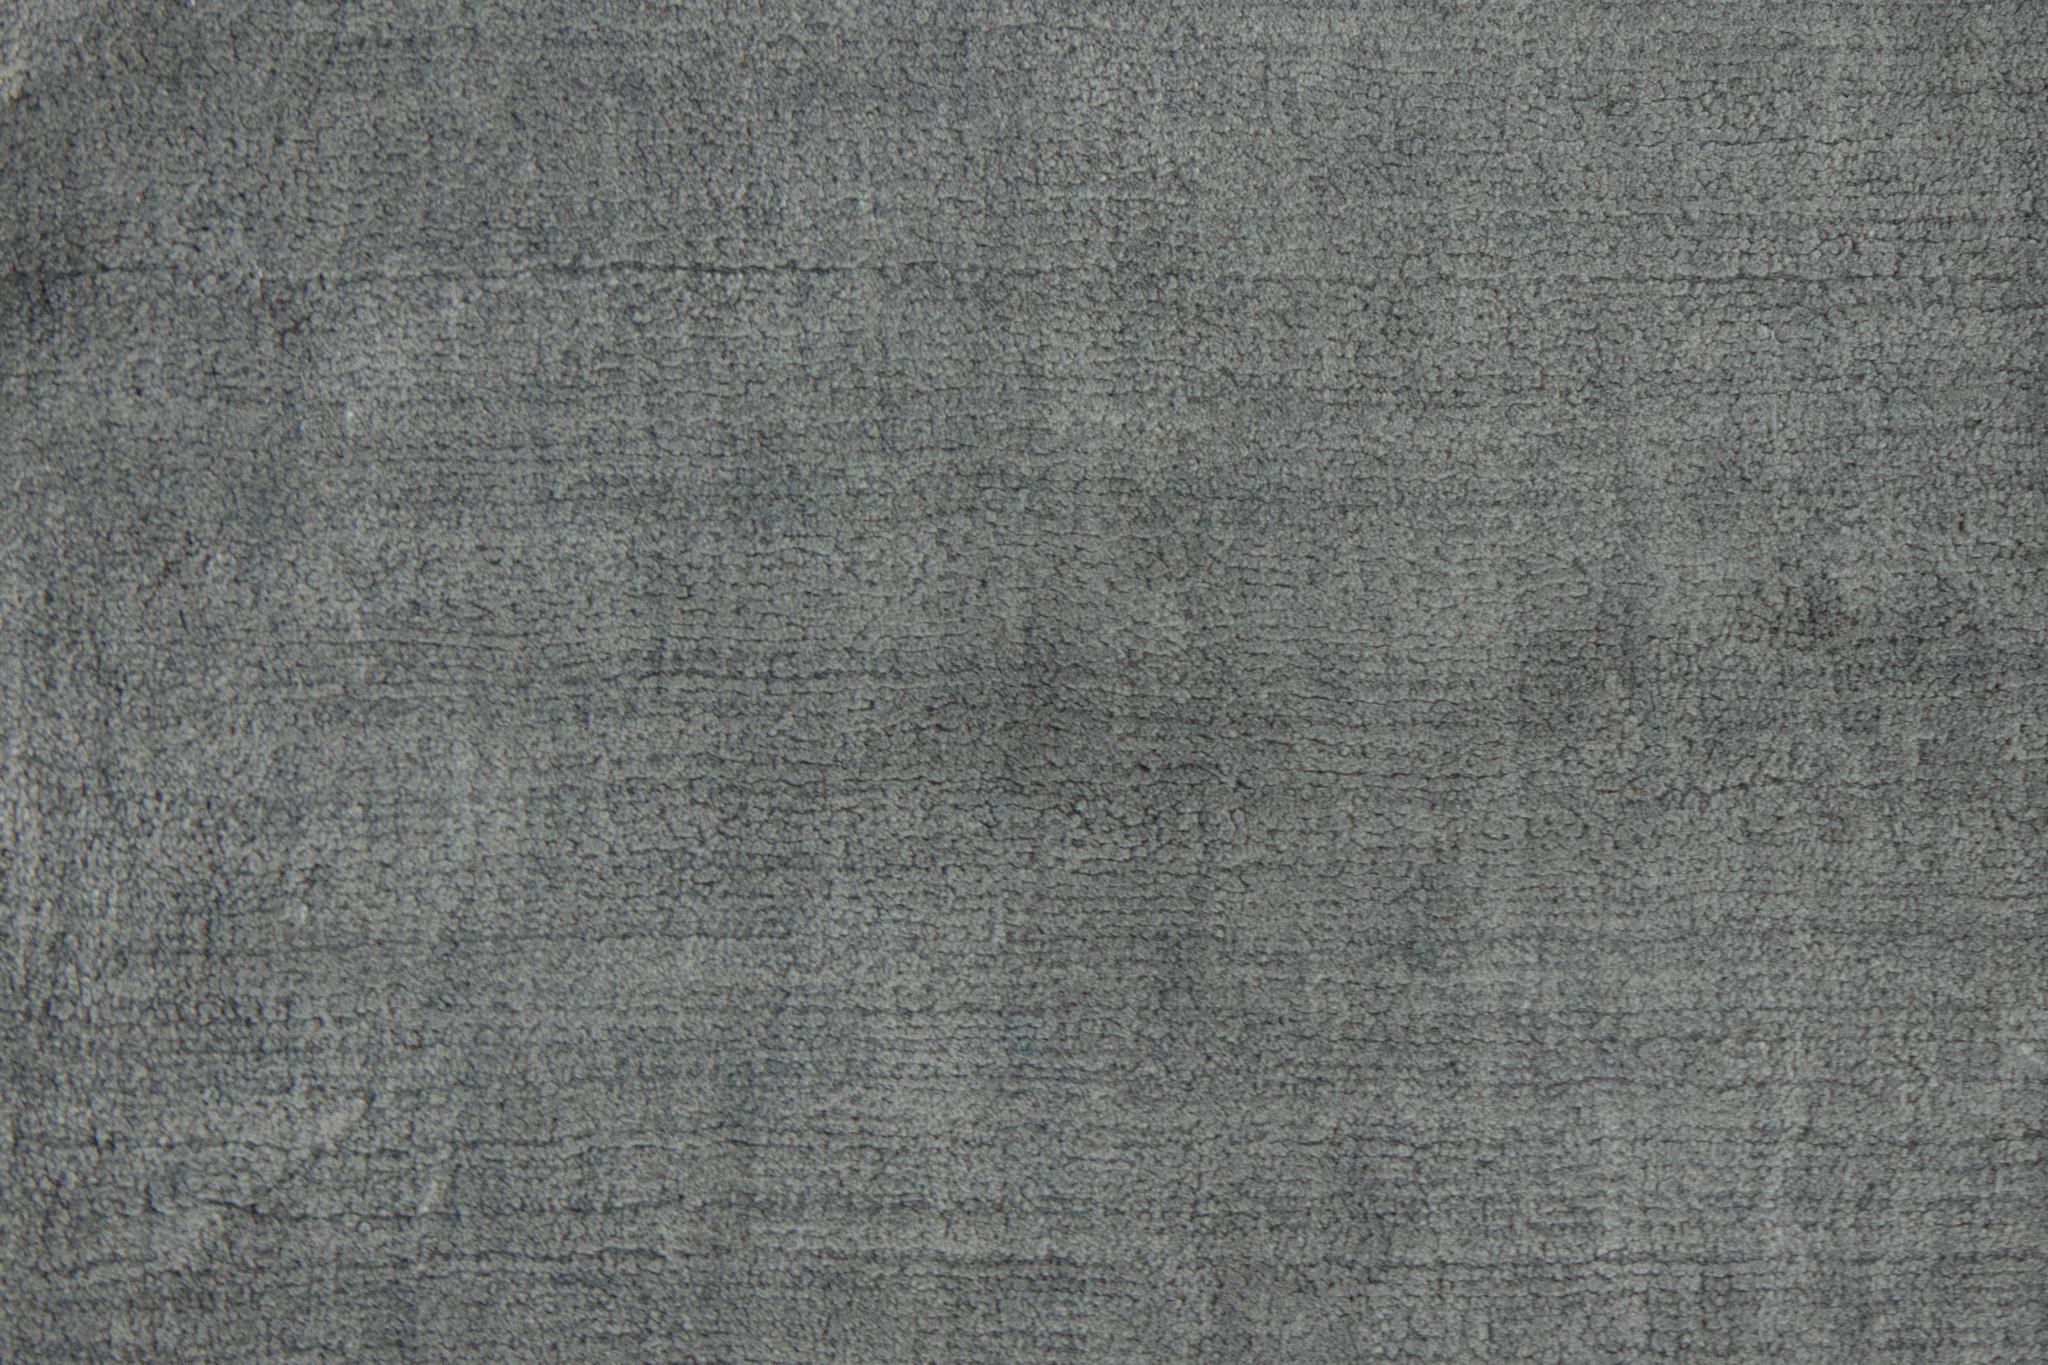 CHIANTI Carpet Steel Grey 300x400-1